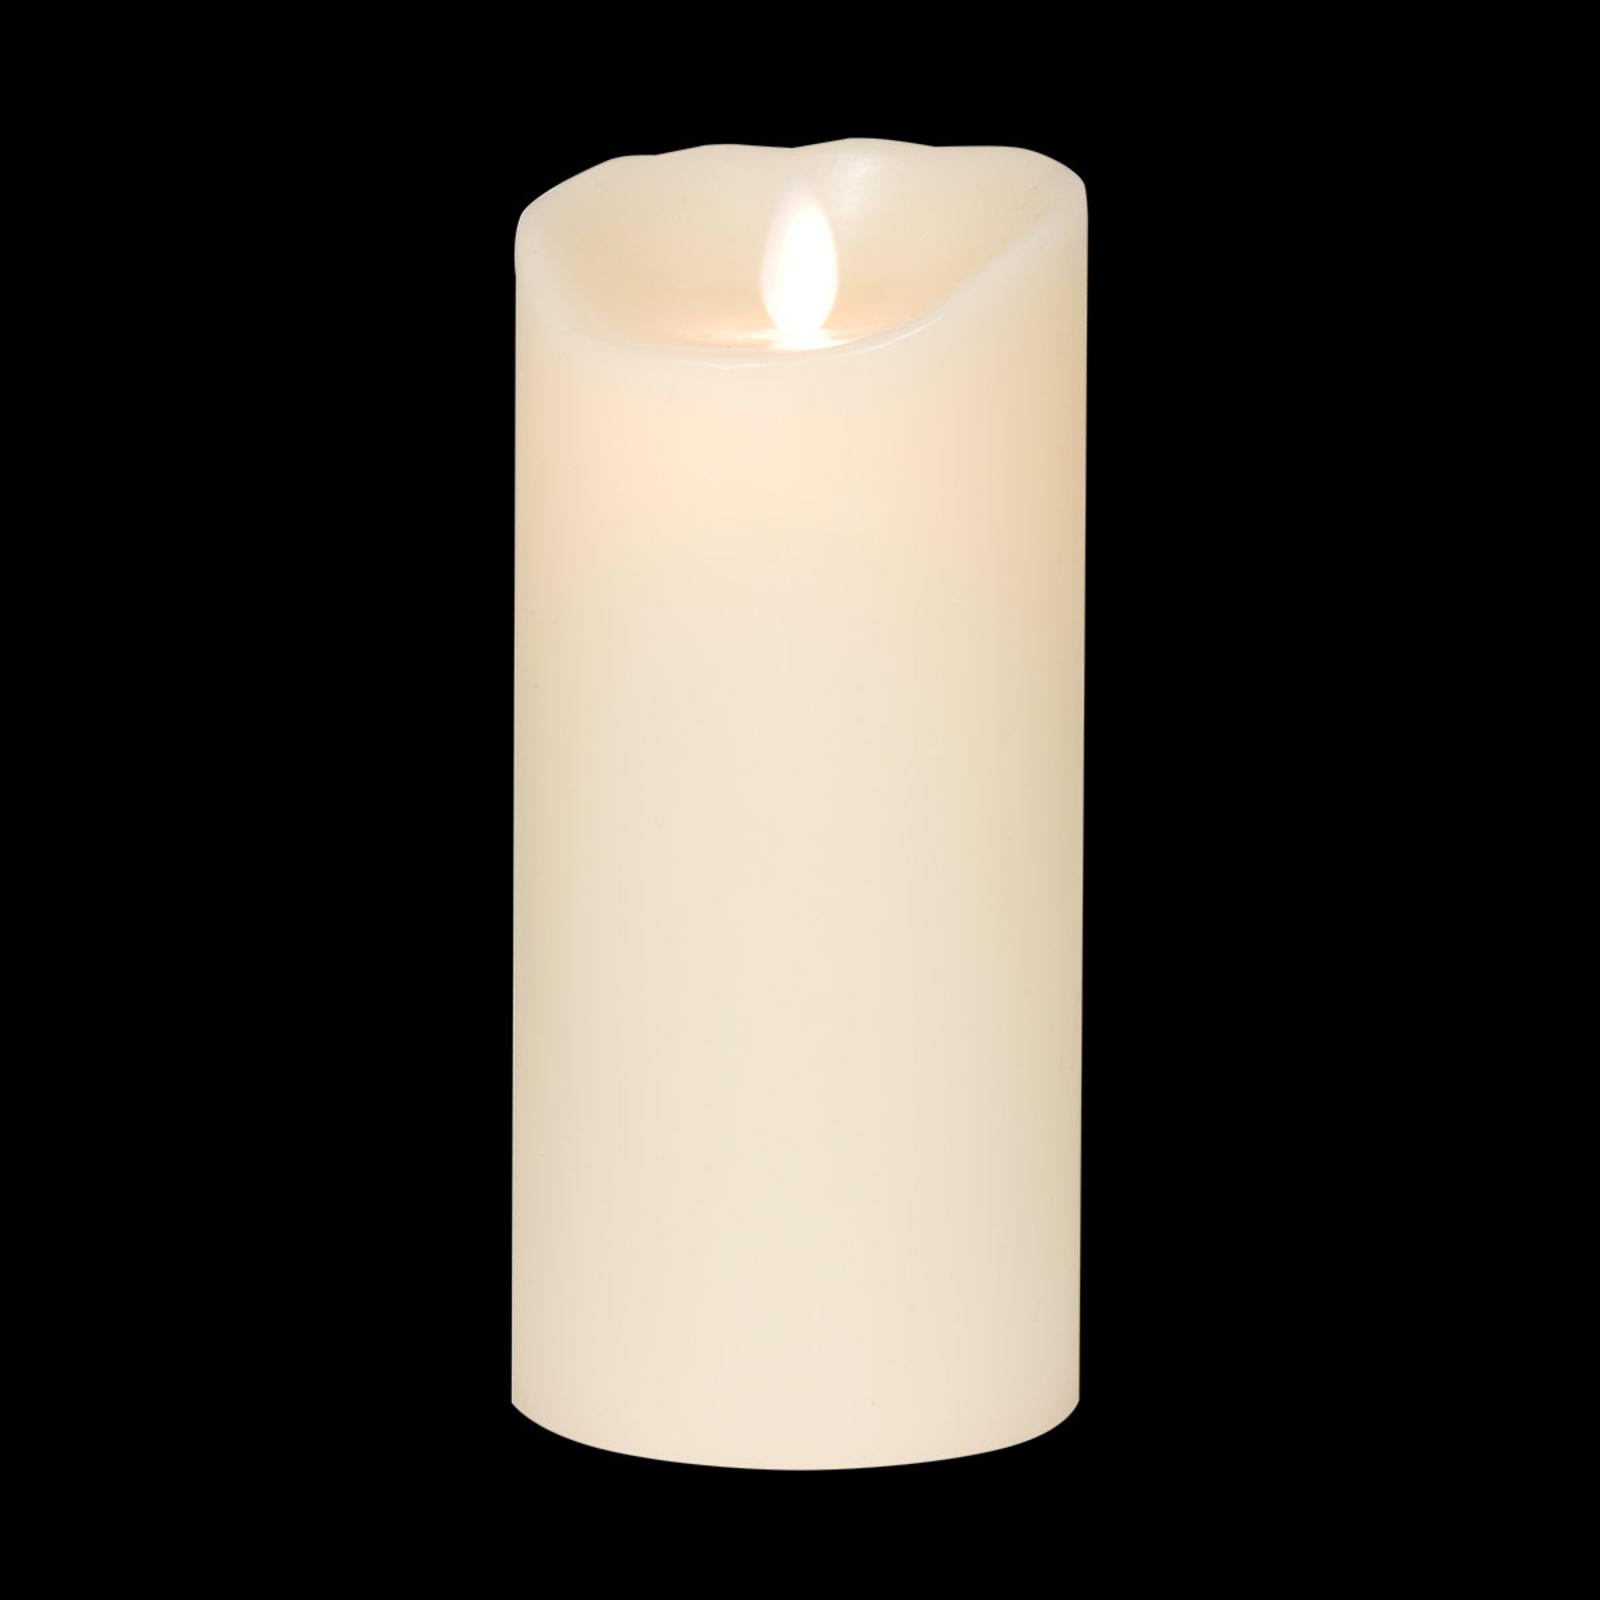 Vela LED Flame de cera real 23 cm